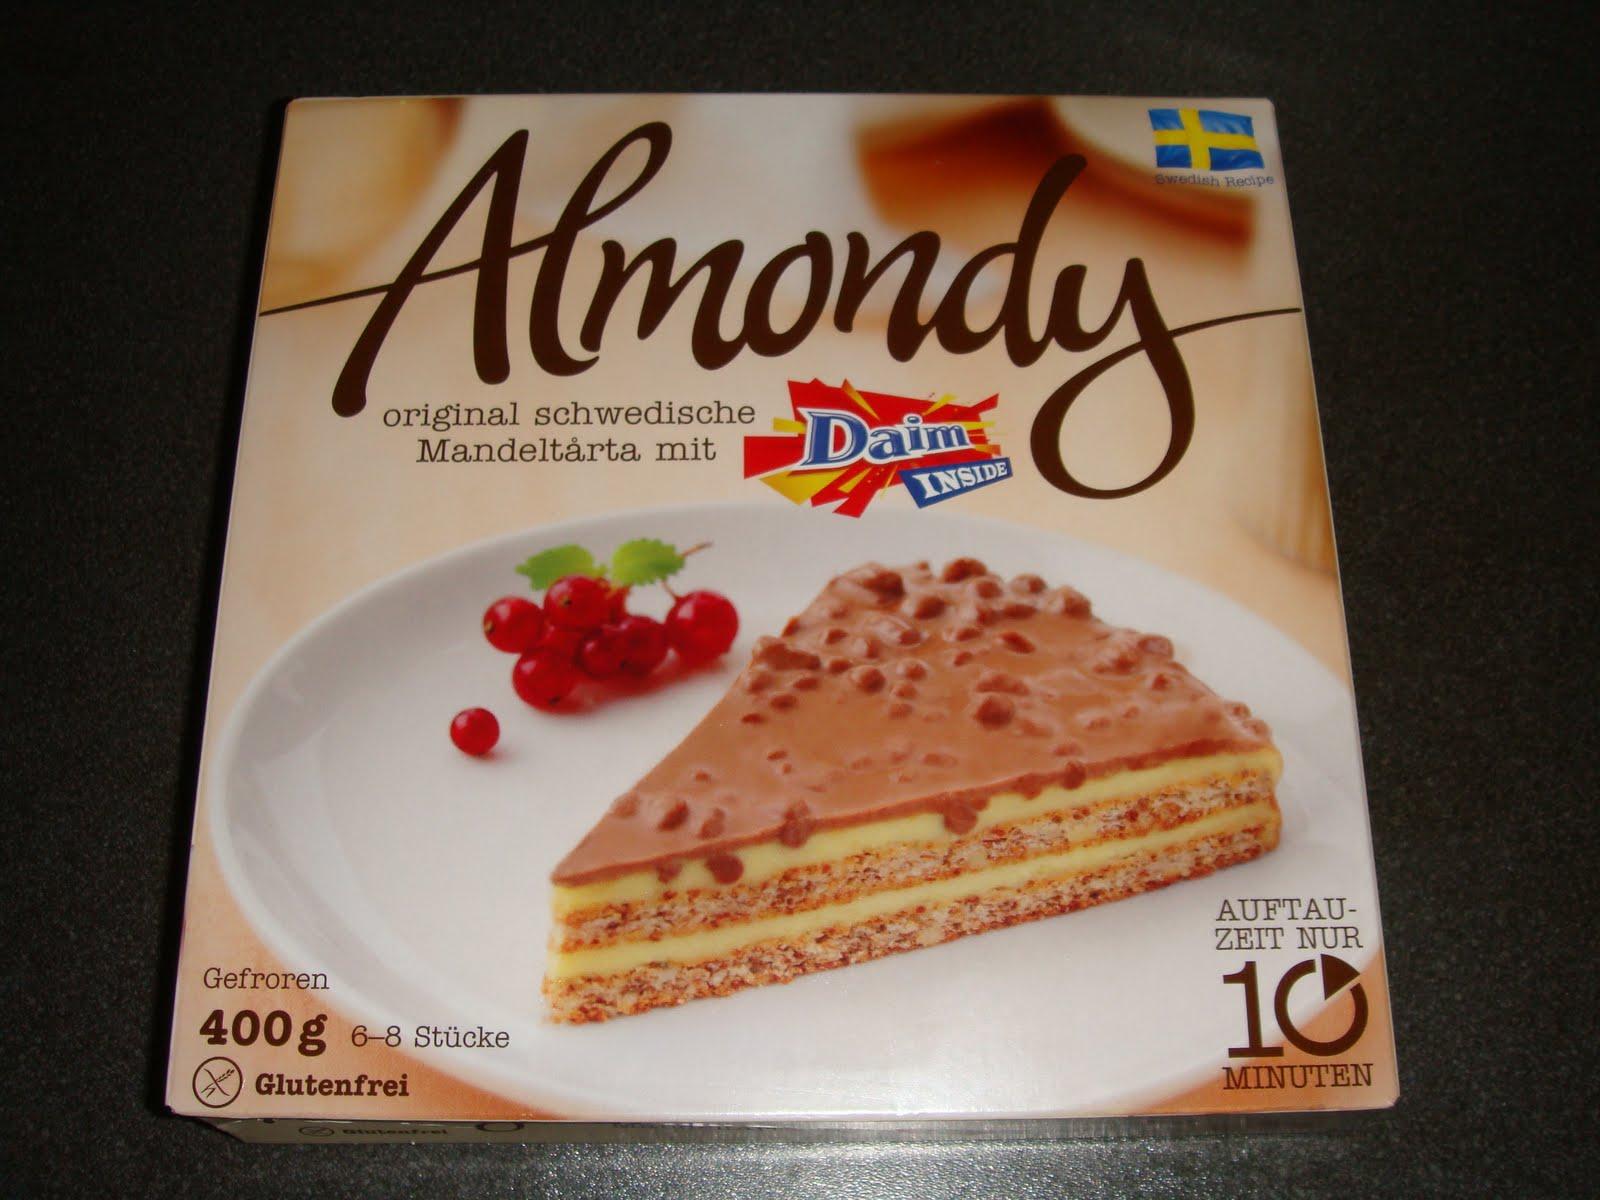 ikea food with Ikeas Almondy Daim Cake on Swedish Fish Soup besides Ikea Mandal Bedroom Set By Mxims also Barbie Logo besides Taskrabbit likewise Organizing Cleaning.